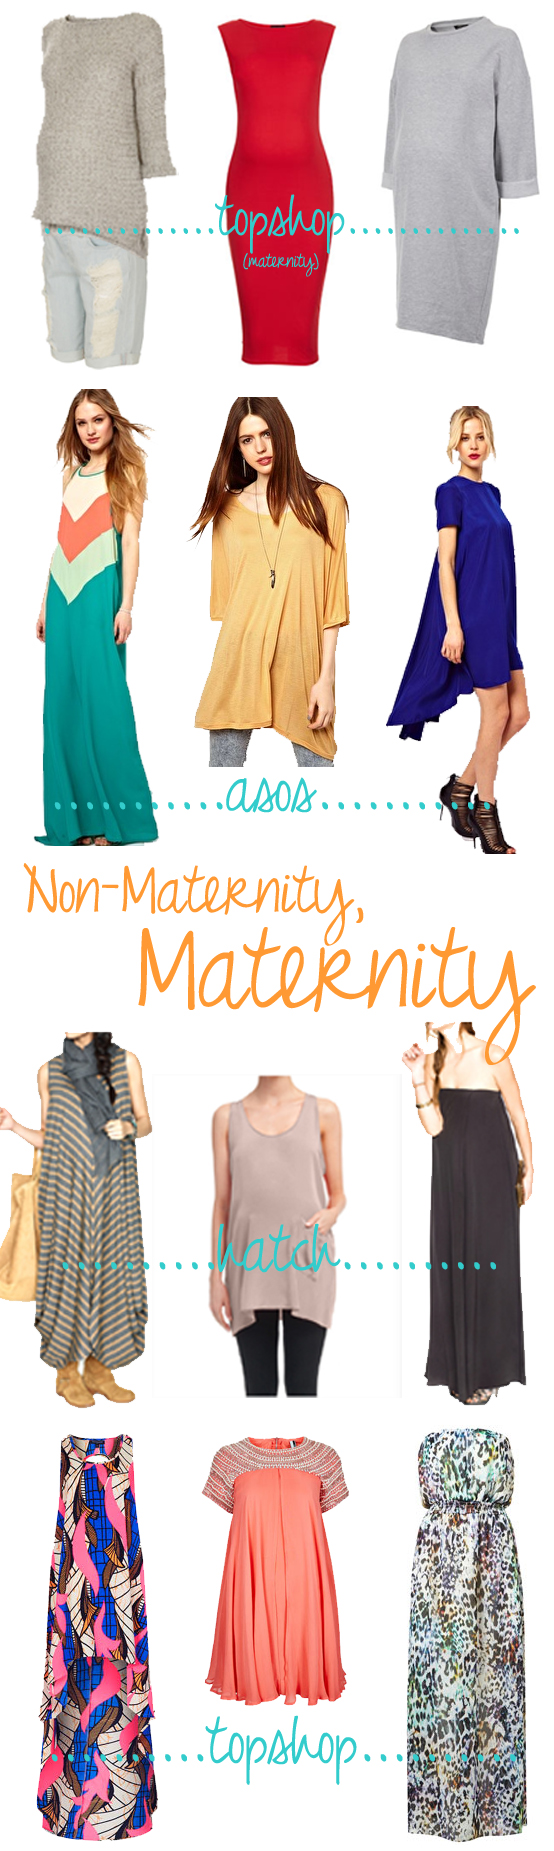 Non-maternity, maternity